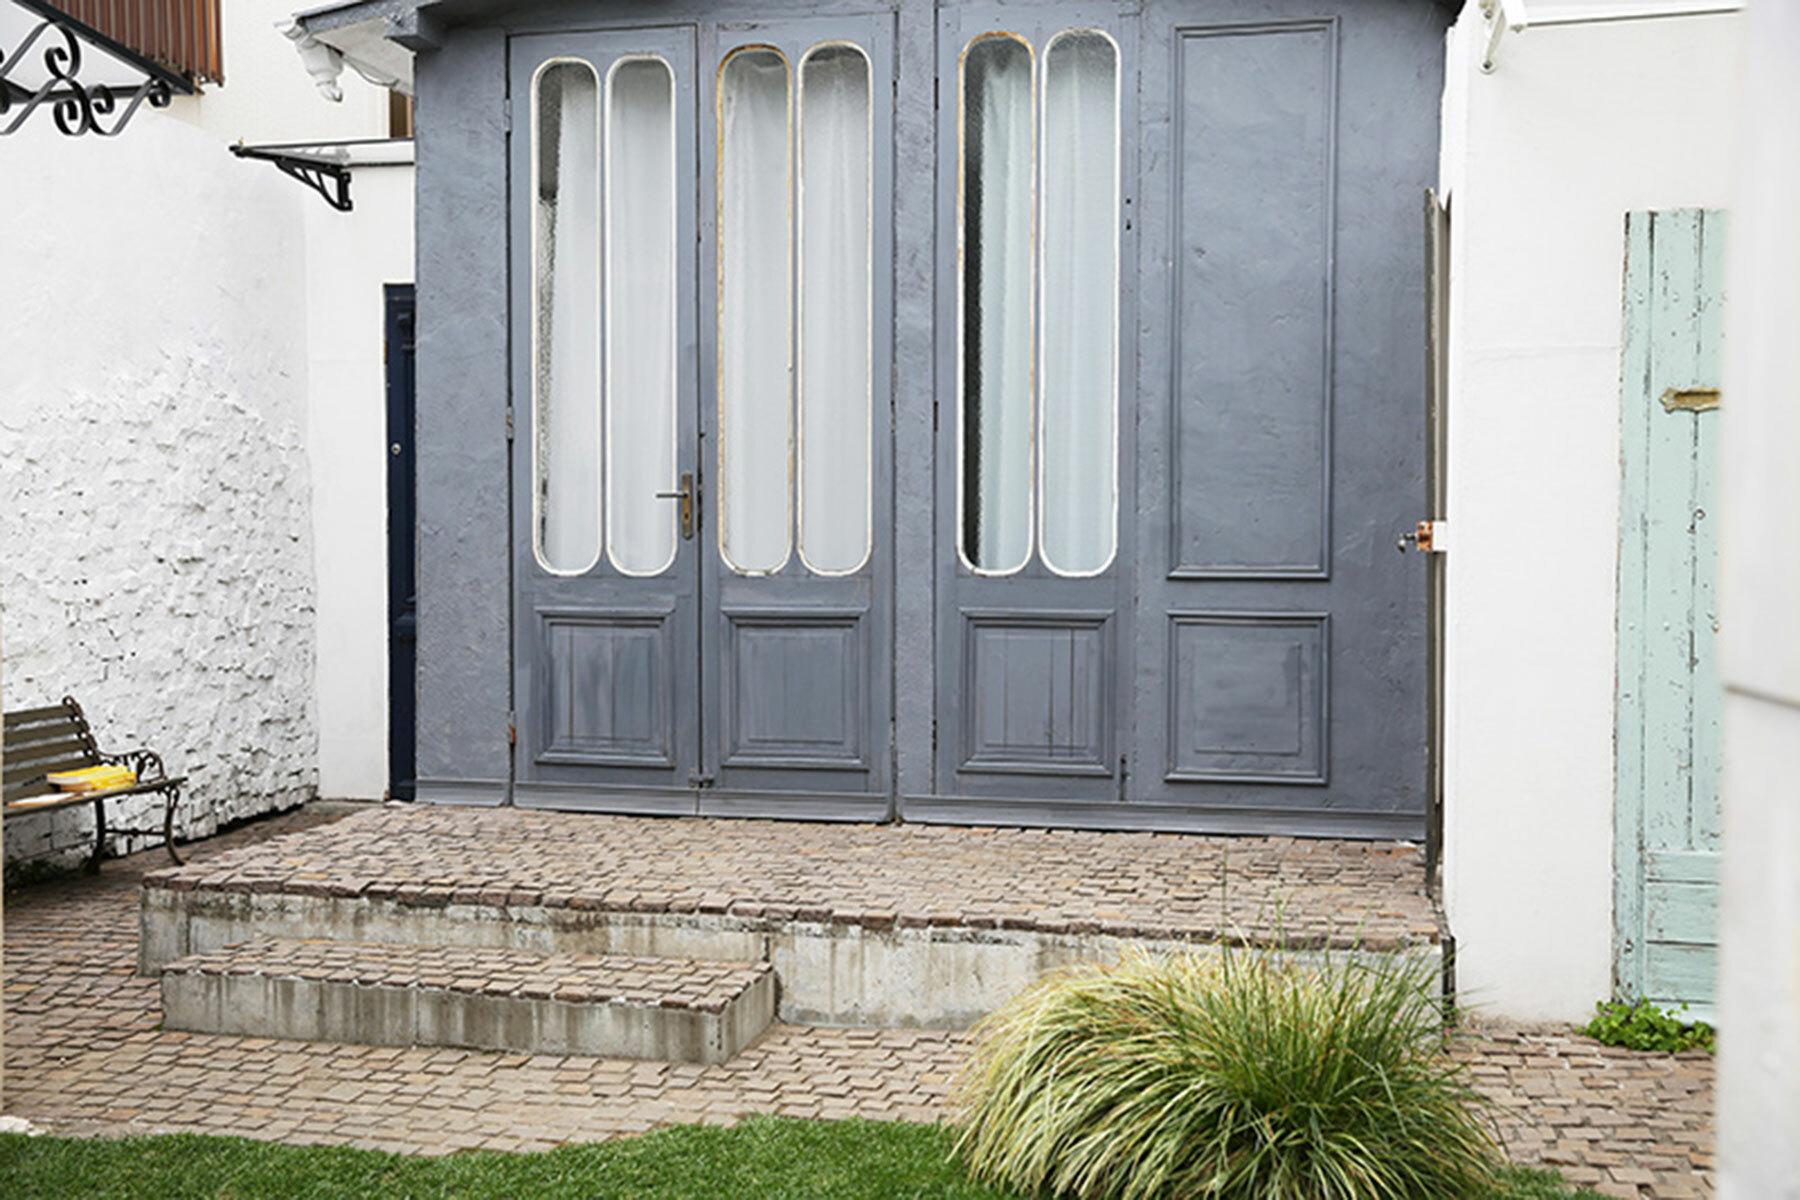 studio douz(ドゥーズ)目黒碑文谷アイアン外扉の内側